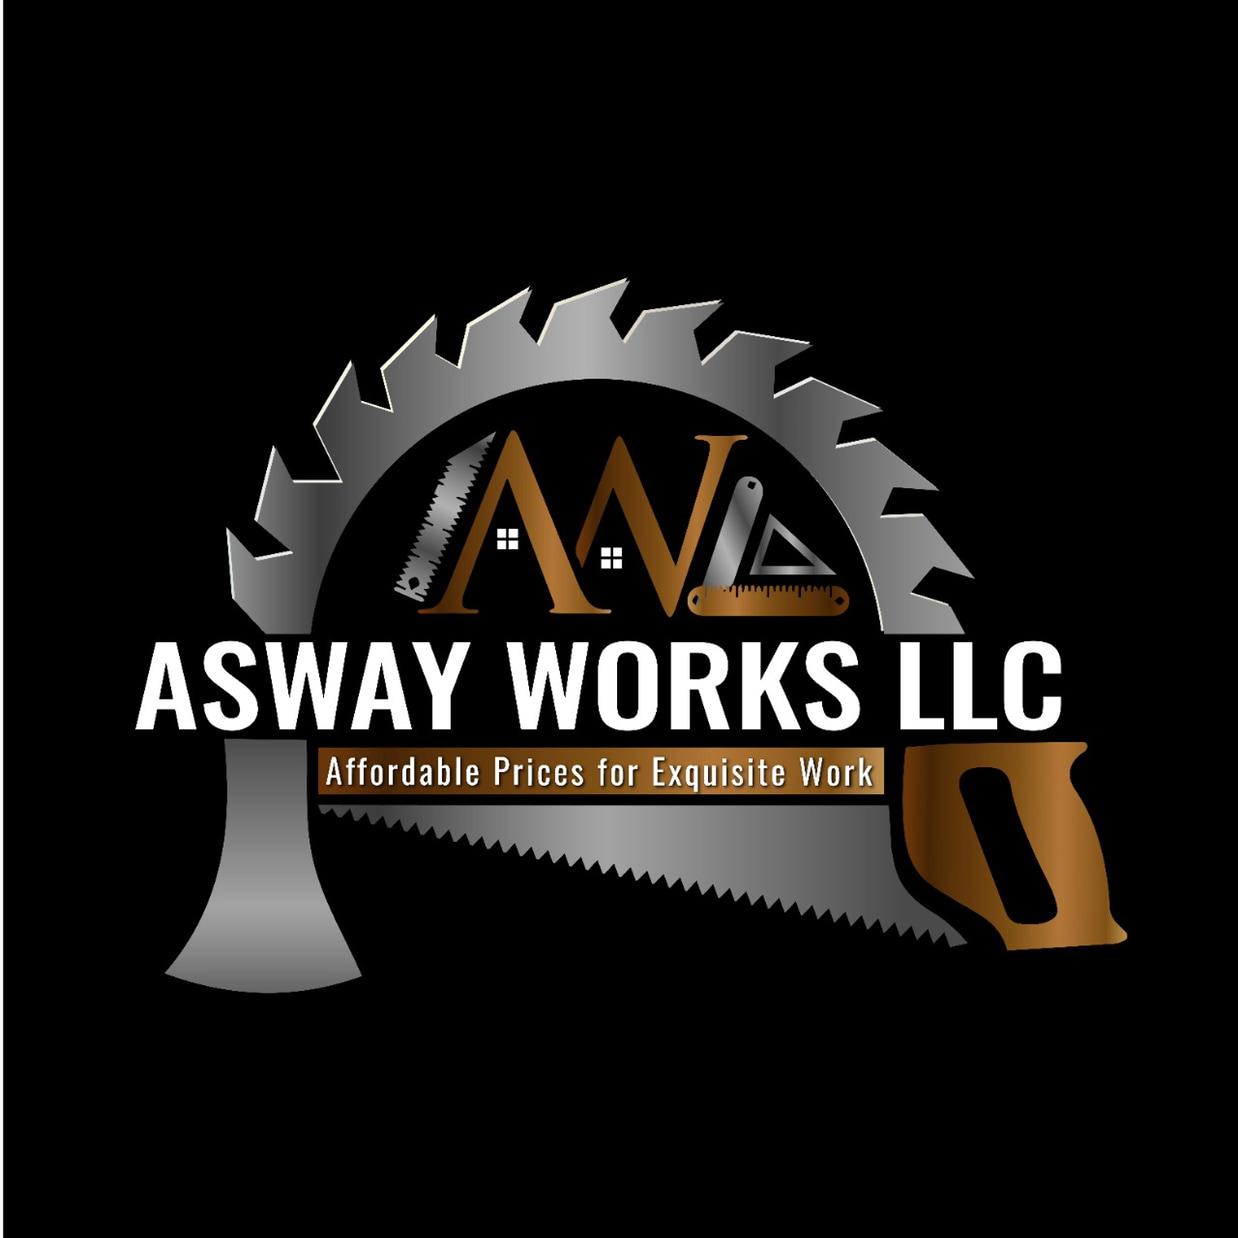 ASWAY Works LLC